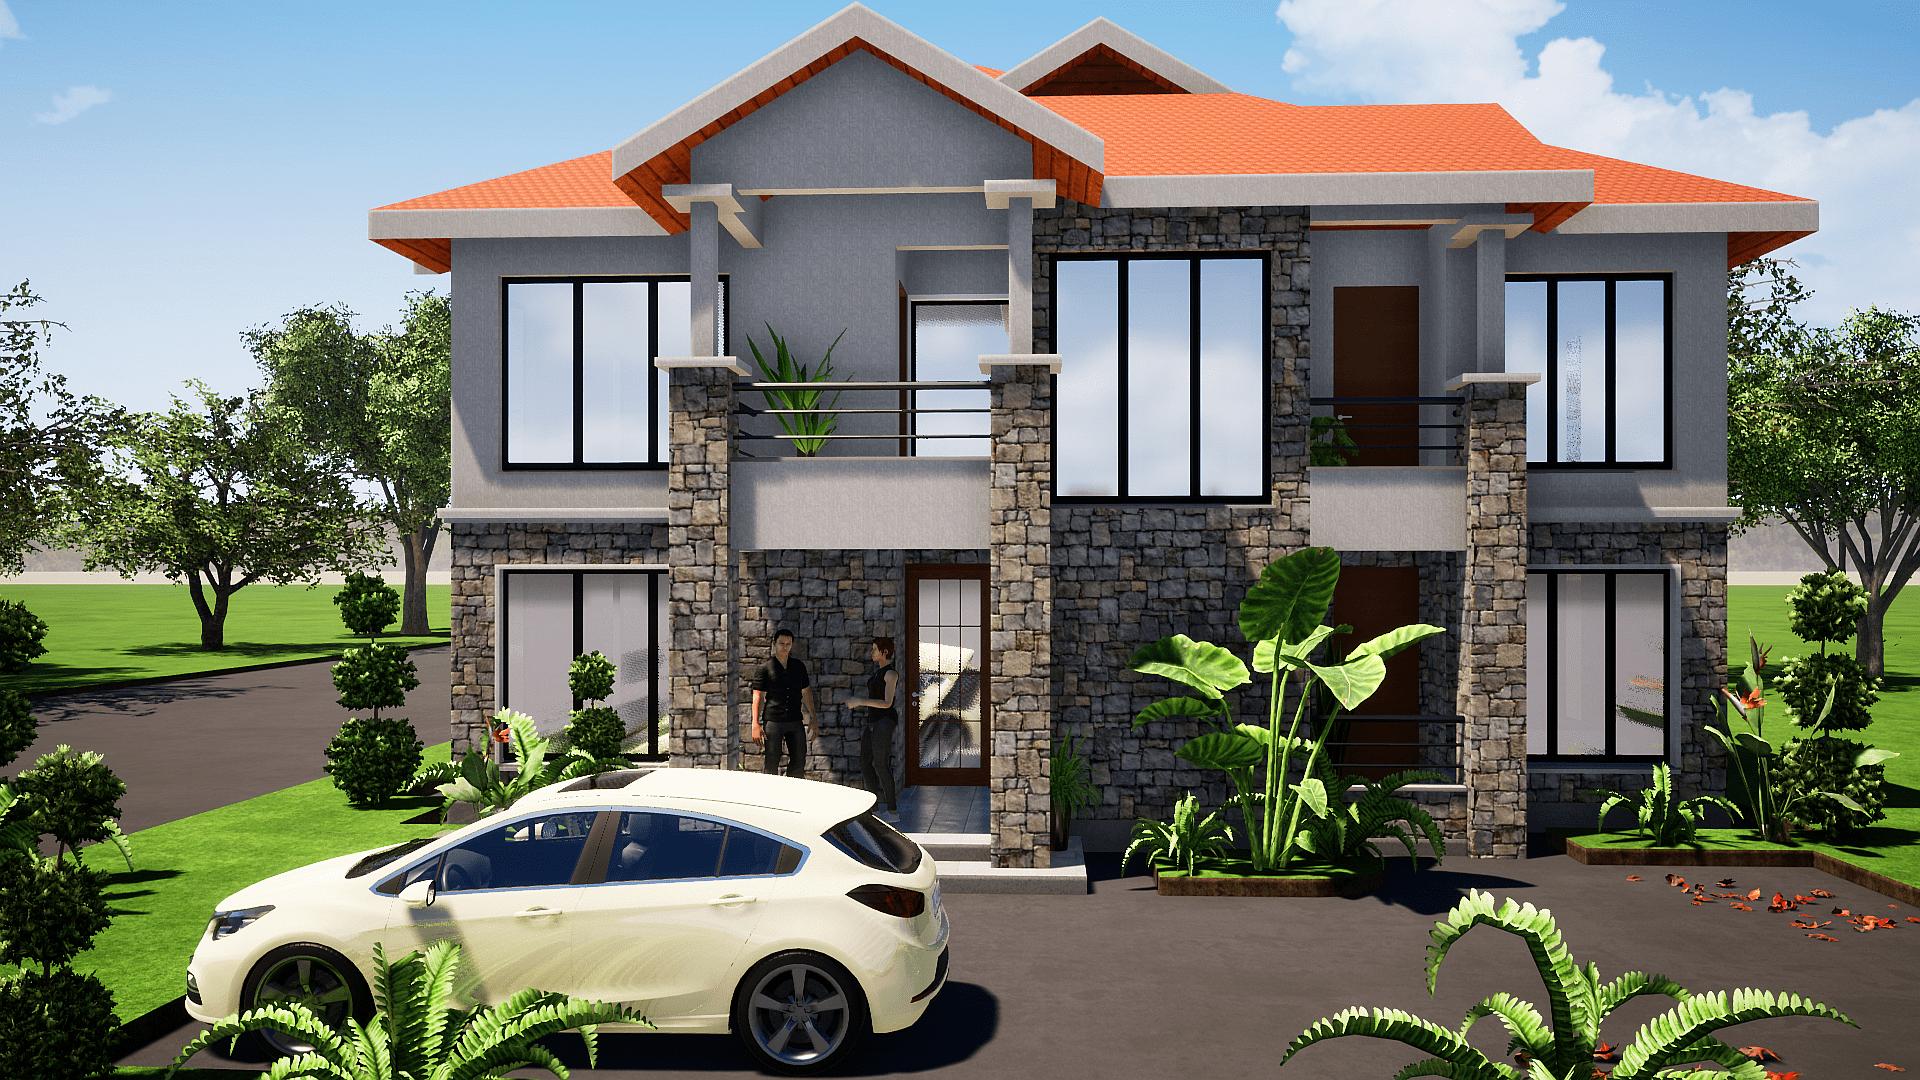 4 Bedroom Maisonette House Plan Muthurwa Com In 2020 House Plans Maisonette 4 Bedroom House Plans